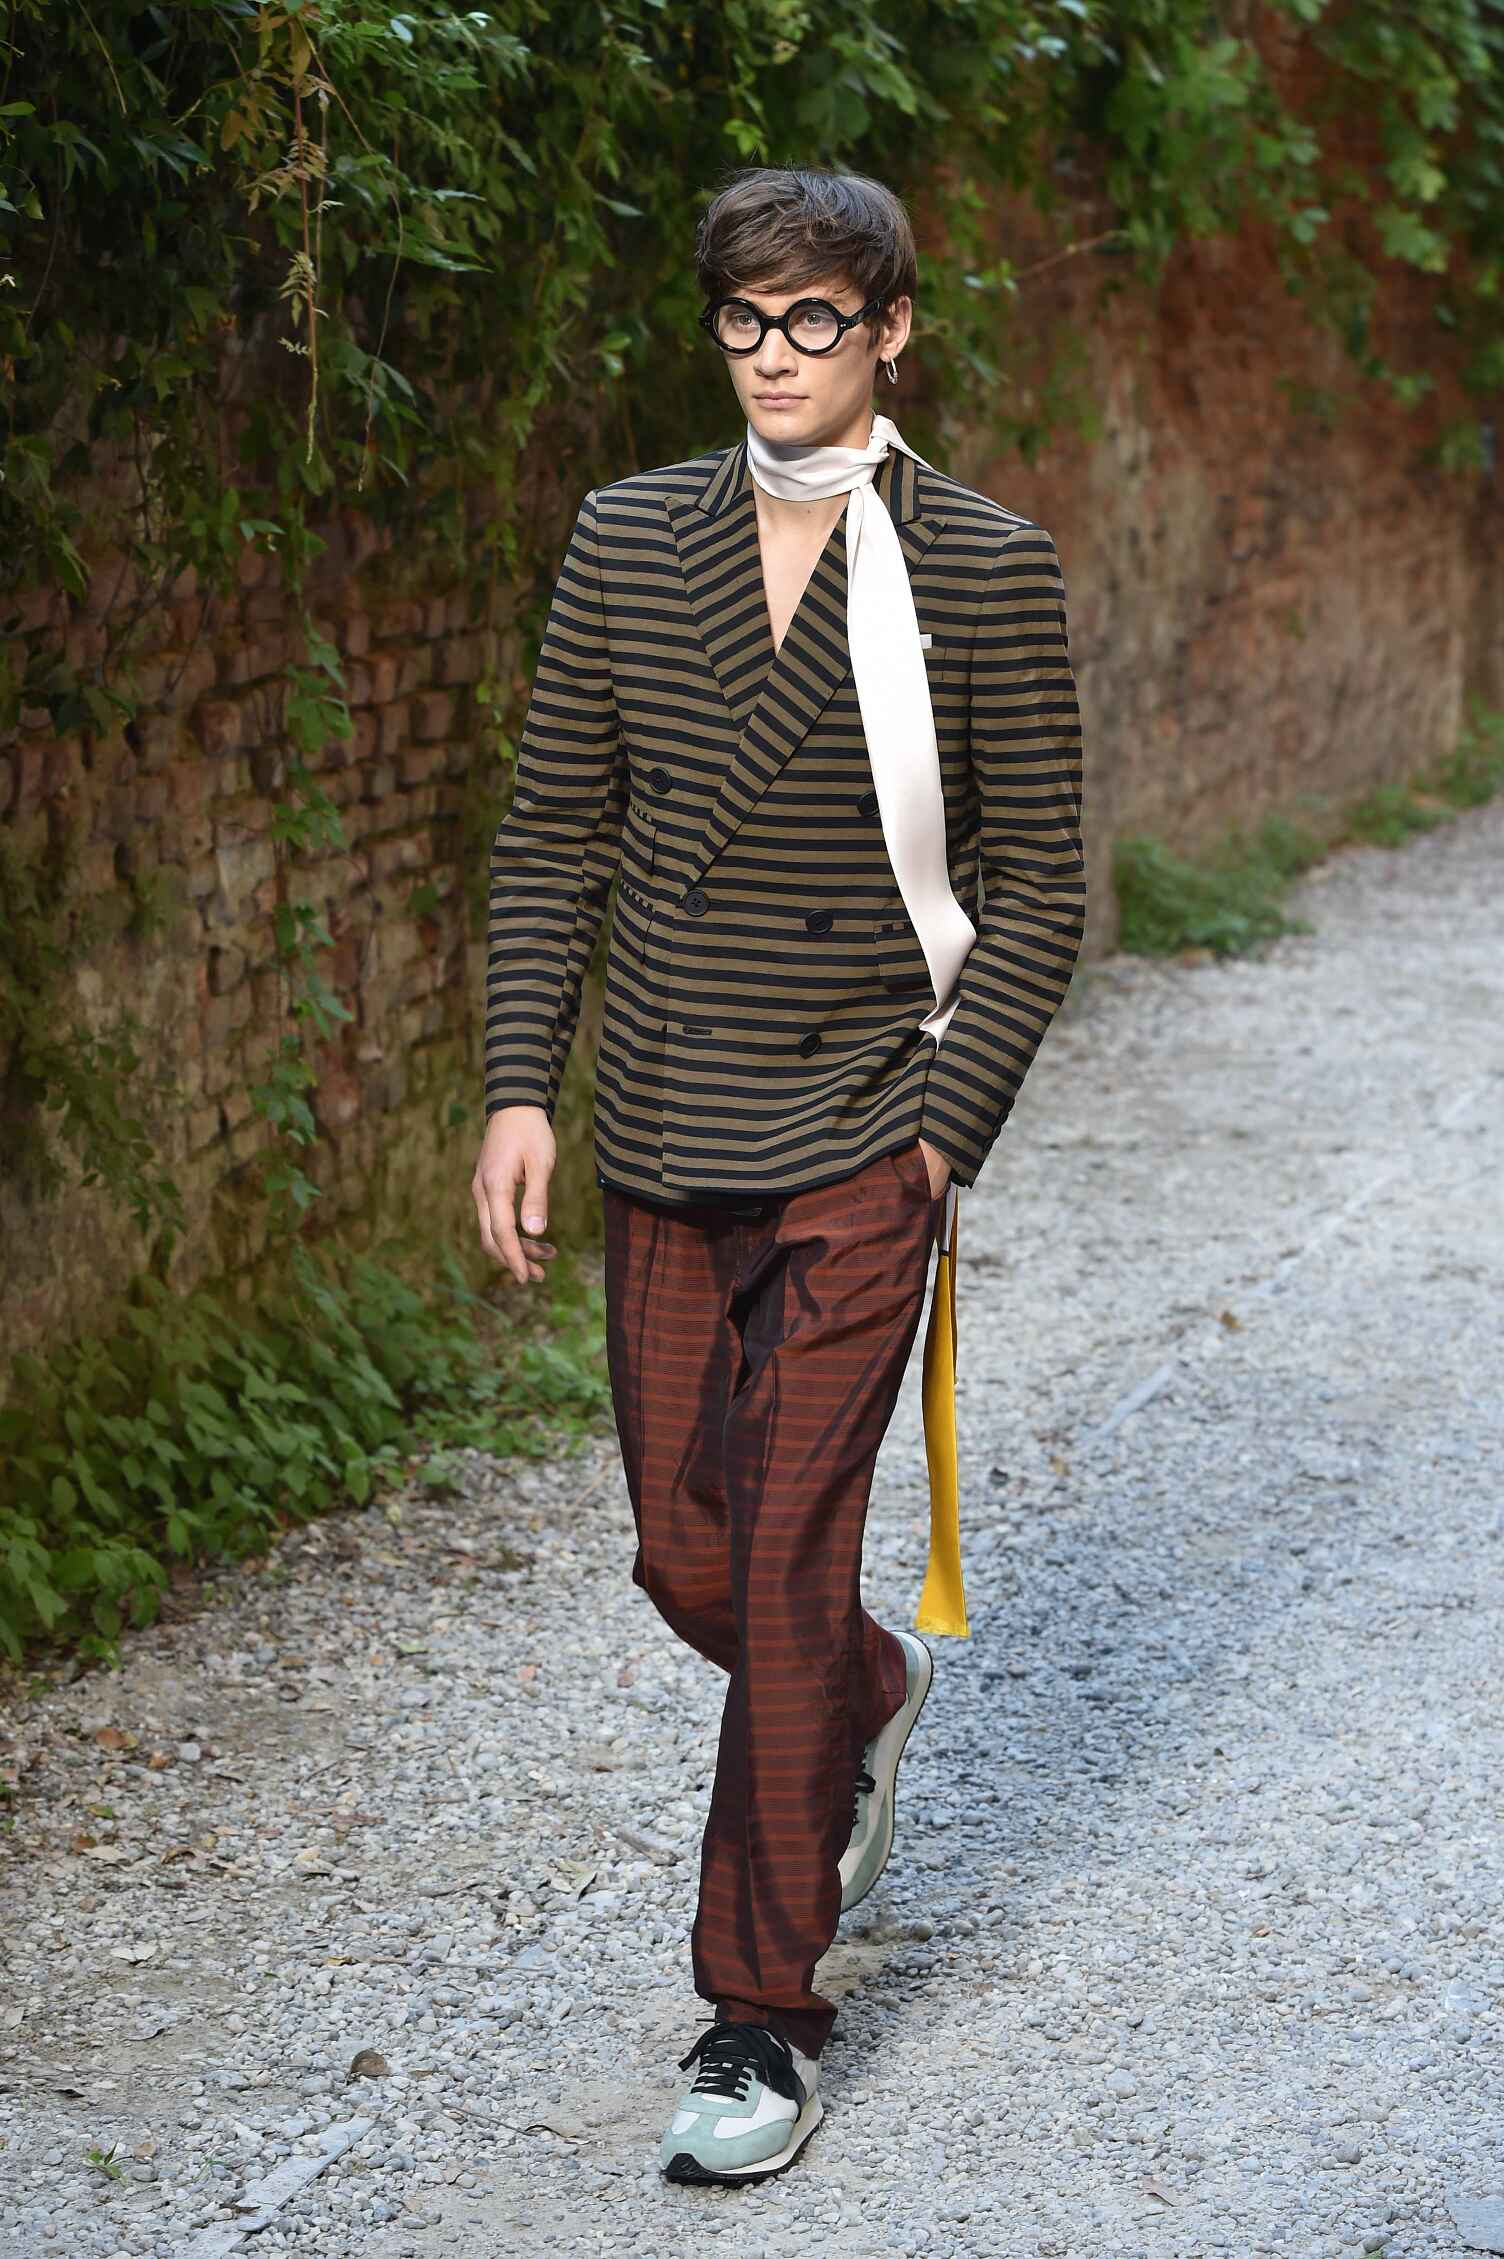 Catwalk Andrea Pompilio Menswear Collection Summer 2016